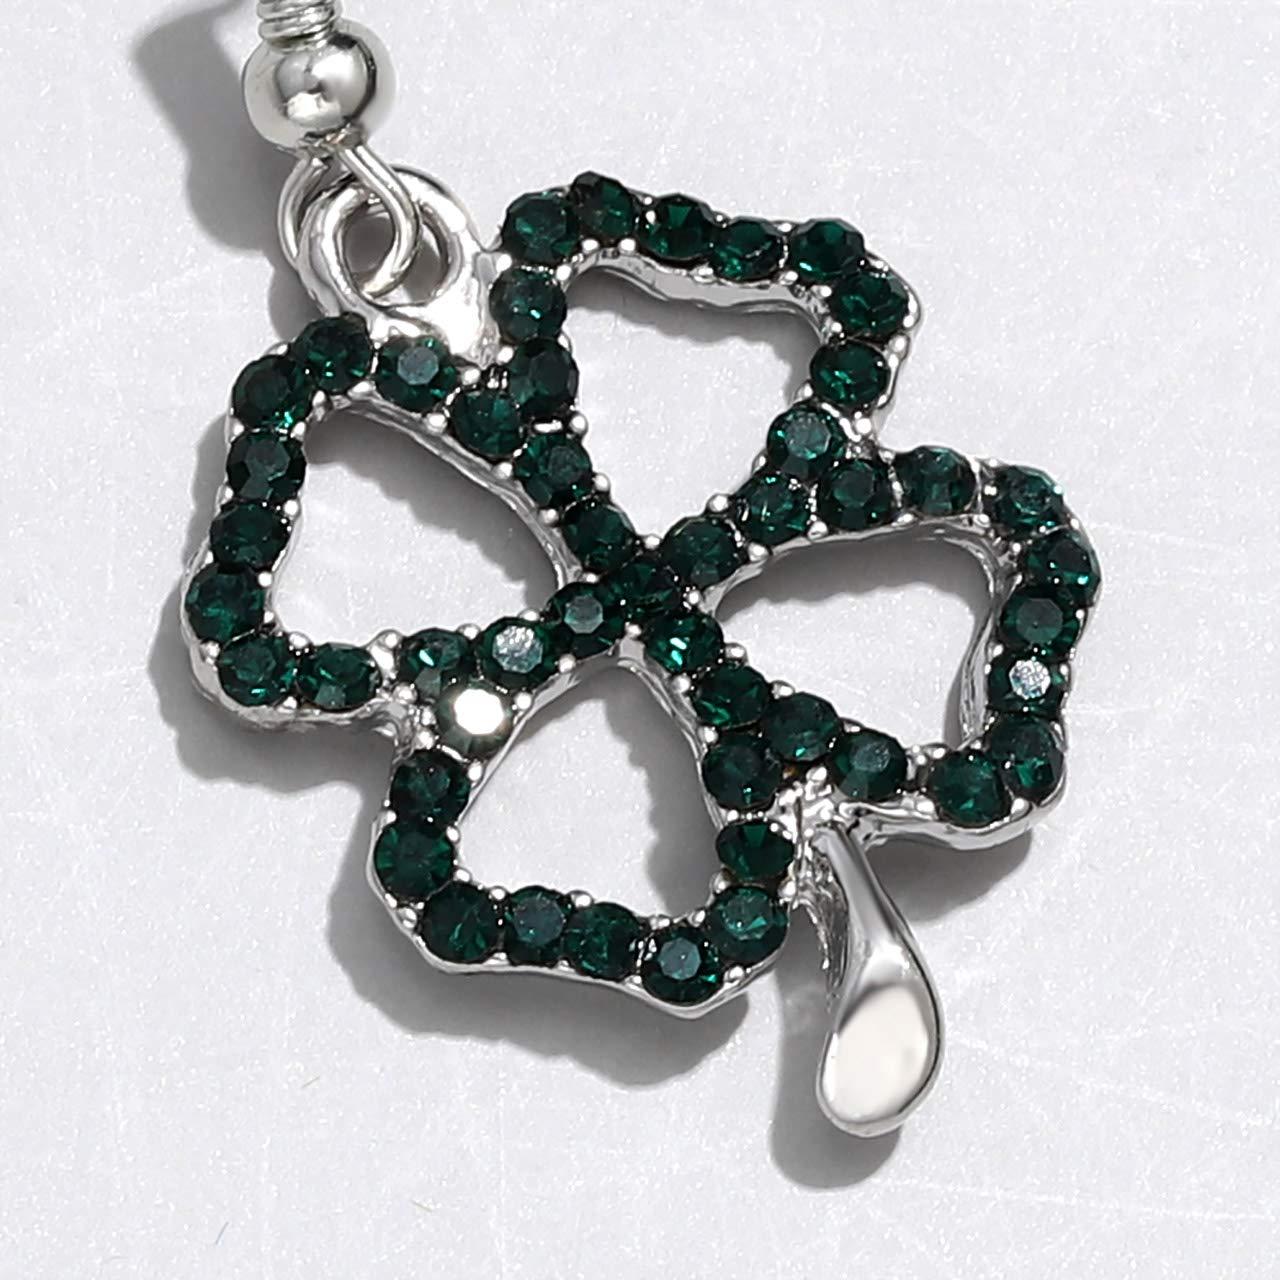 CEALXHENY St Patricks Earrings Green Earrings for Women Crystal Leaf Drop Dangle Earring Set Gift for Girls